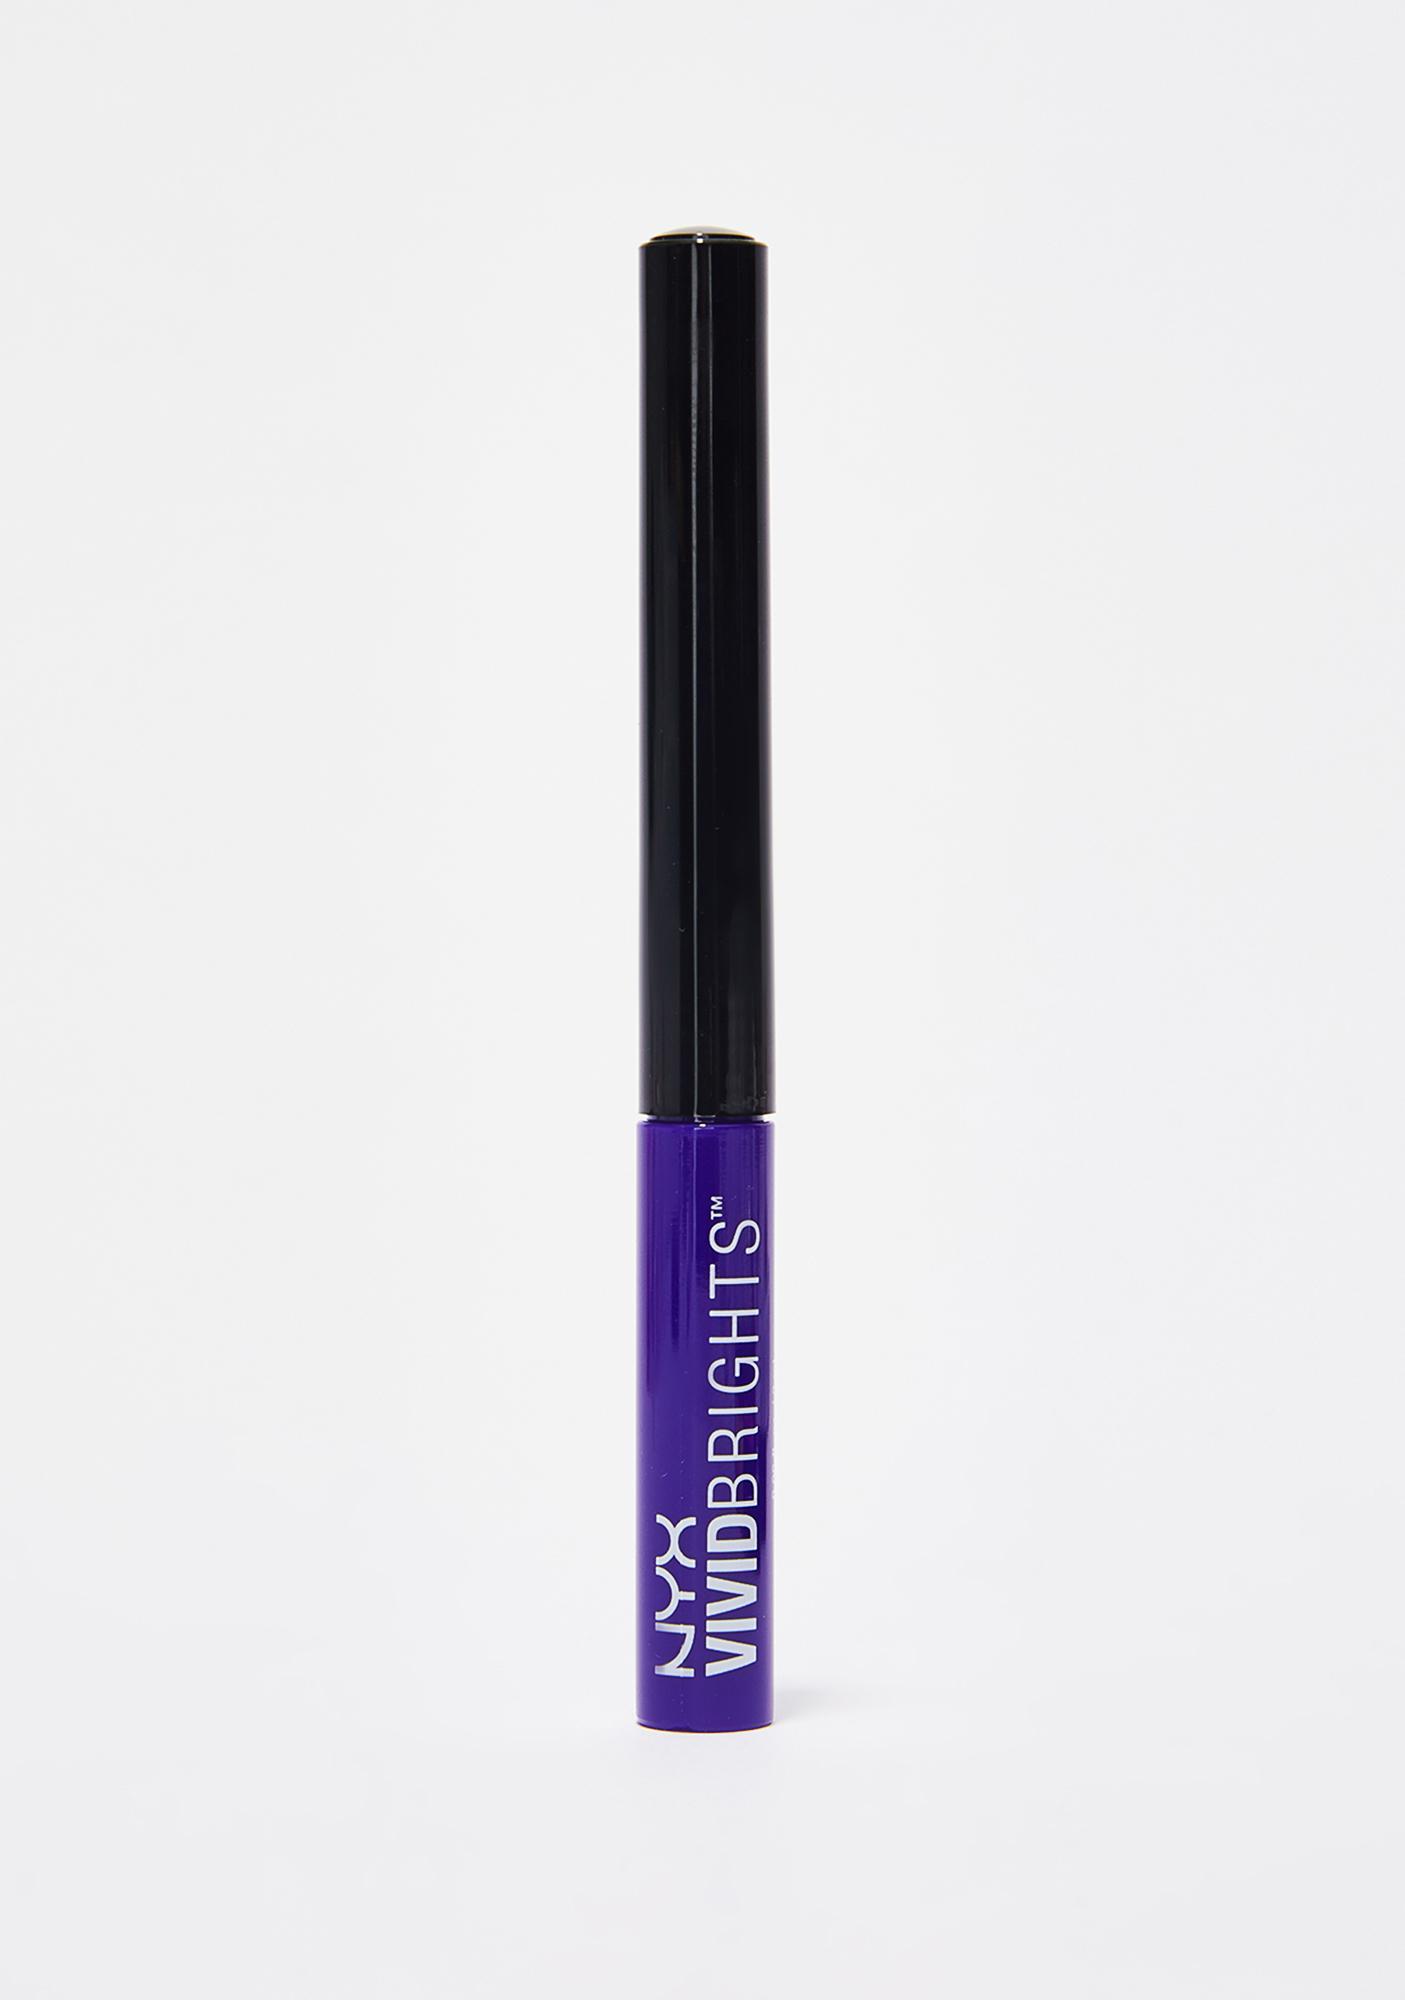 NYX Vivid Violet Vivid Brights Eyeliner